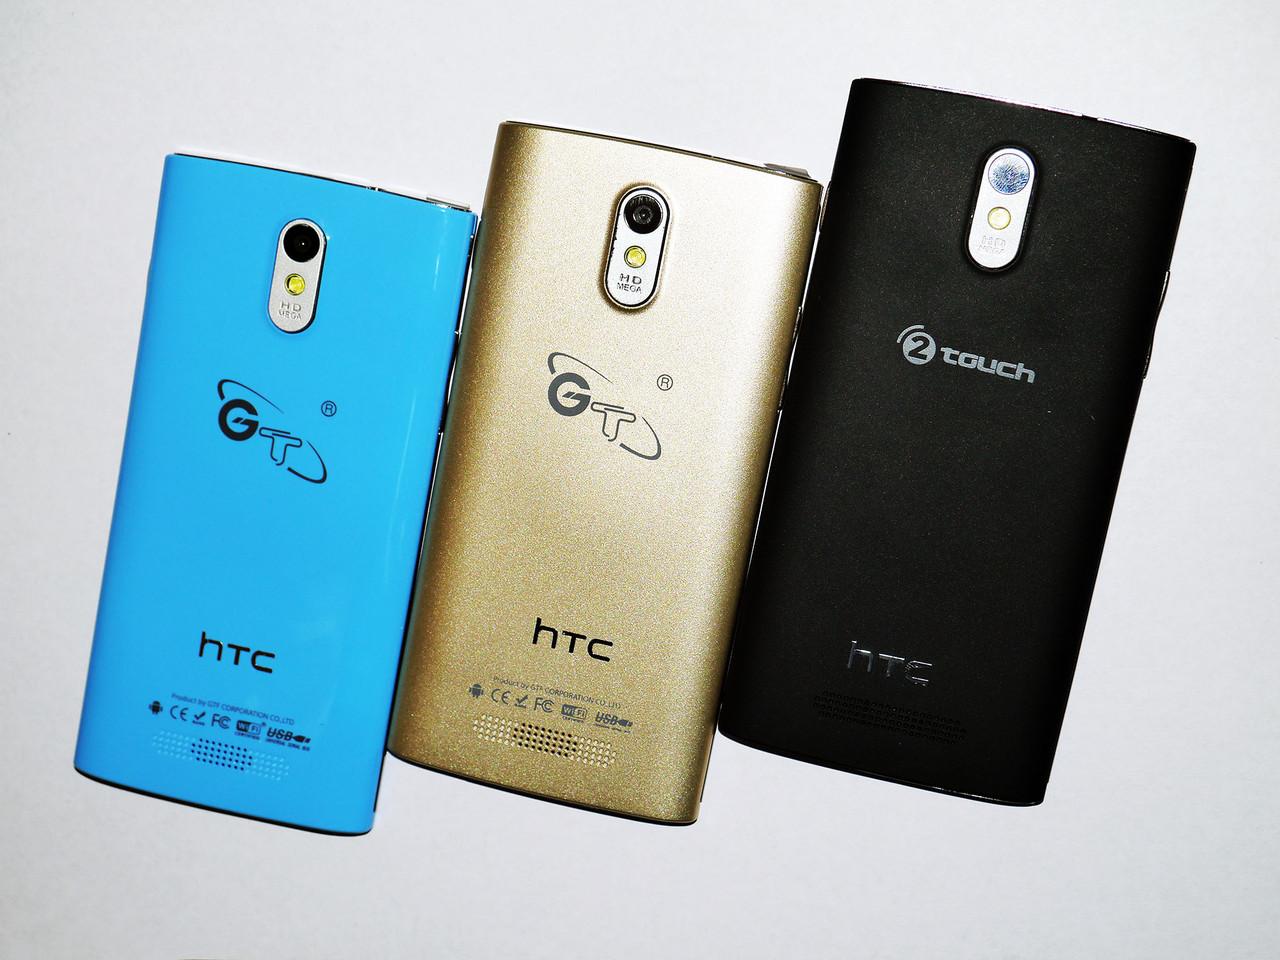 "HTC GT-M7 экран 4.5"" 4 ядра, WiFi, 2 sim, Android 4.2.2, камера 2MP"